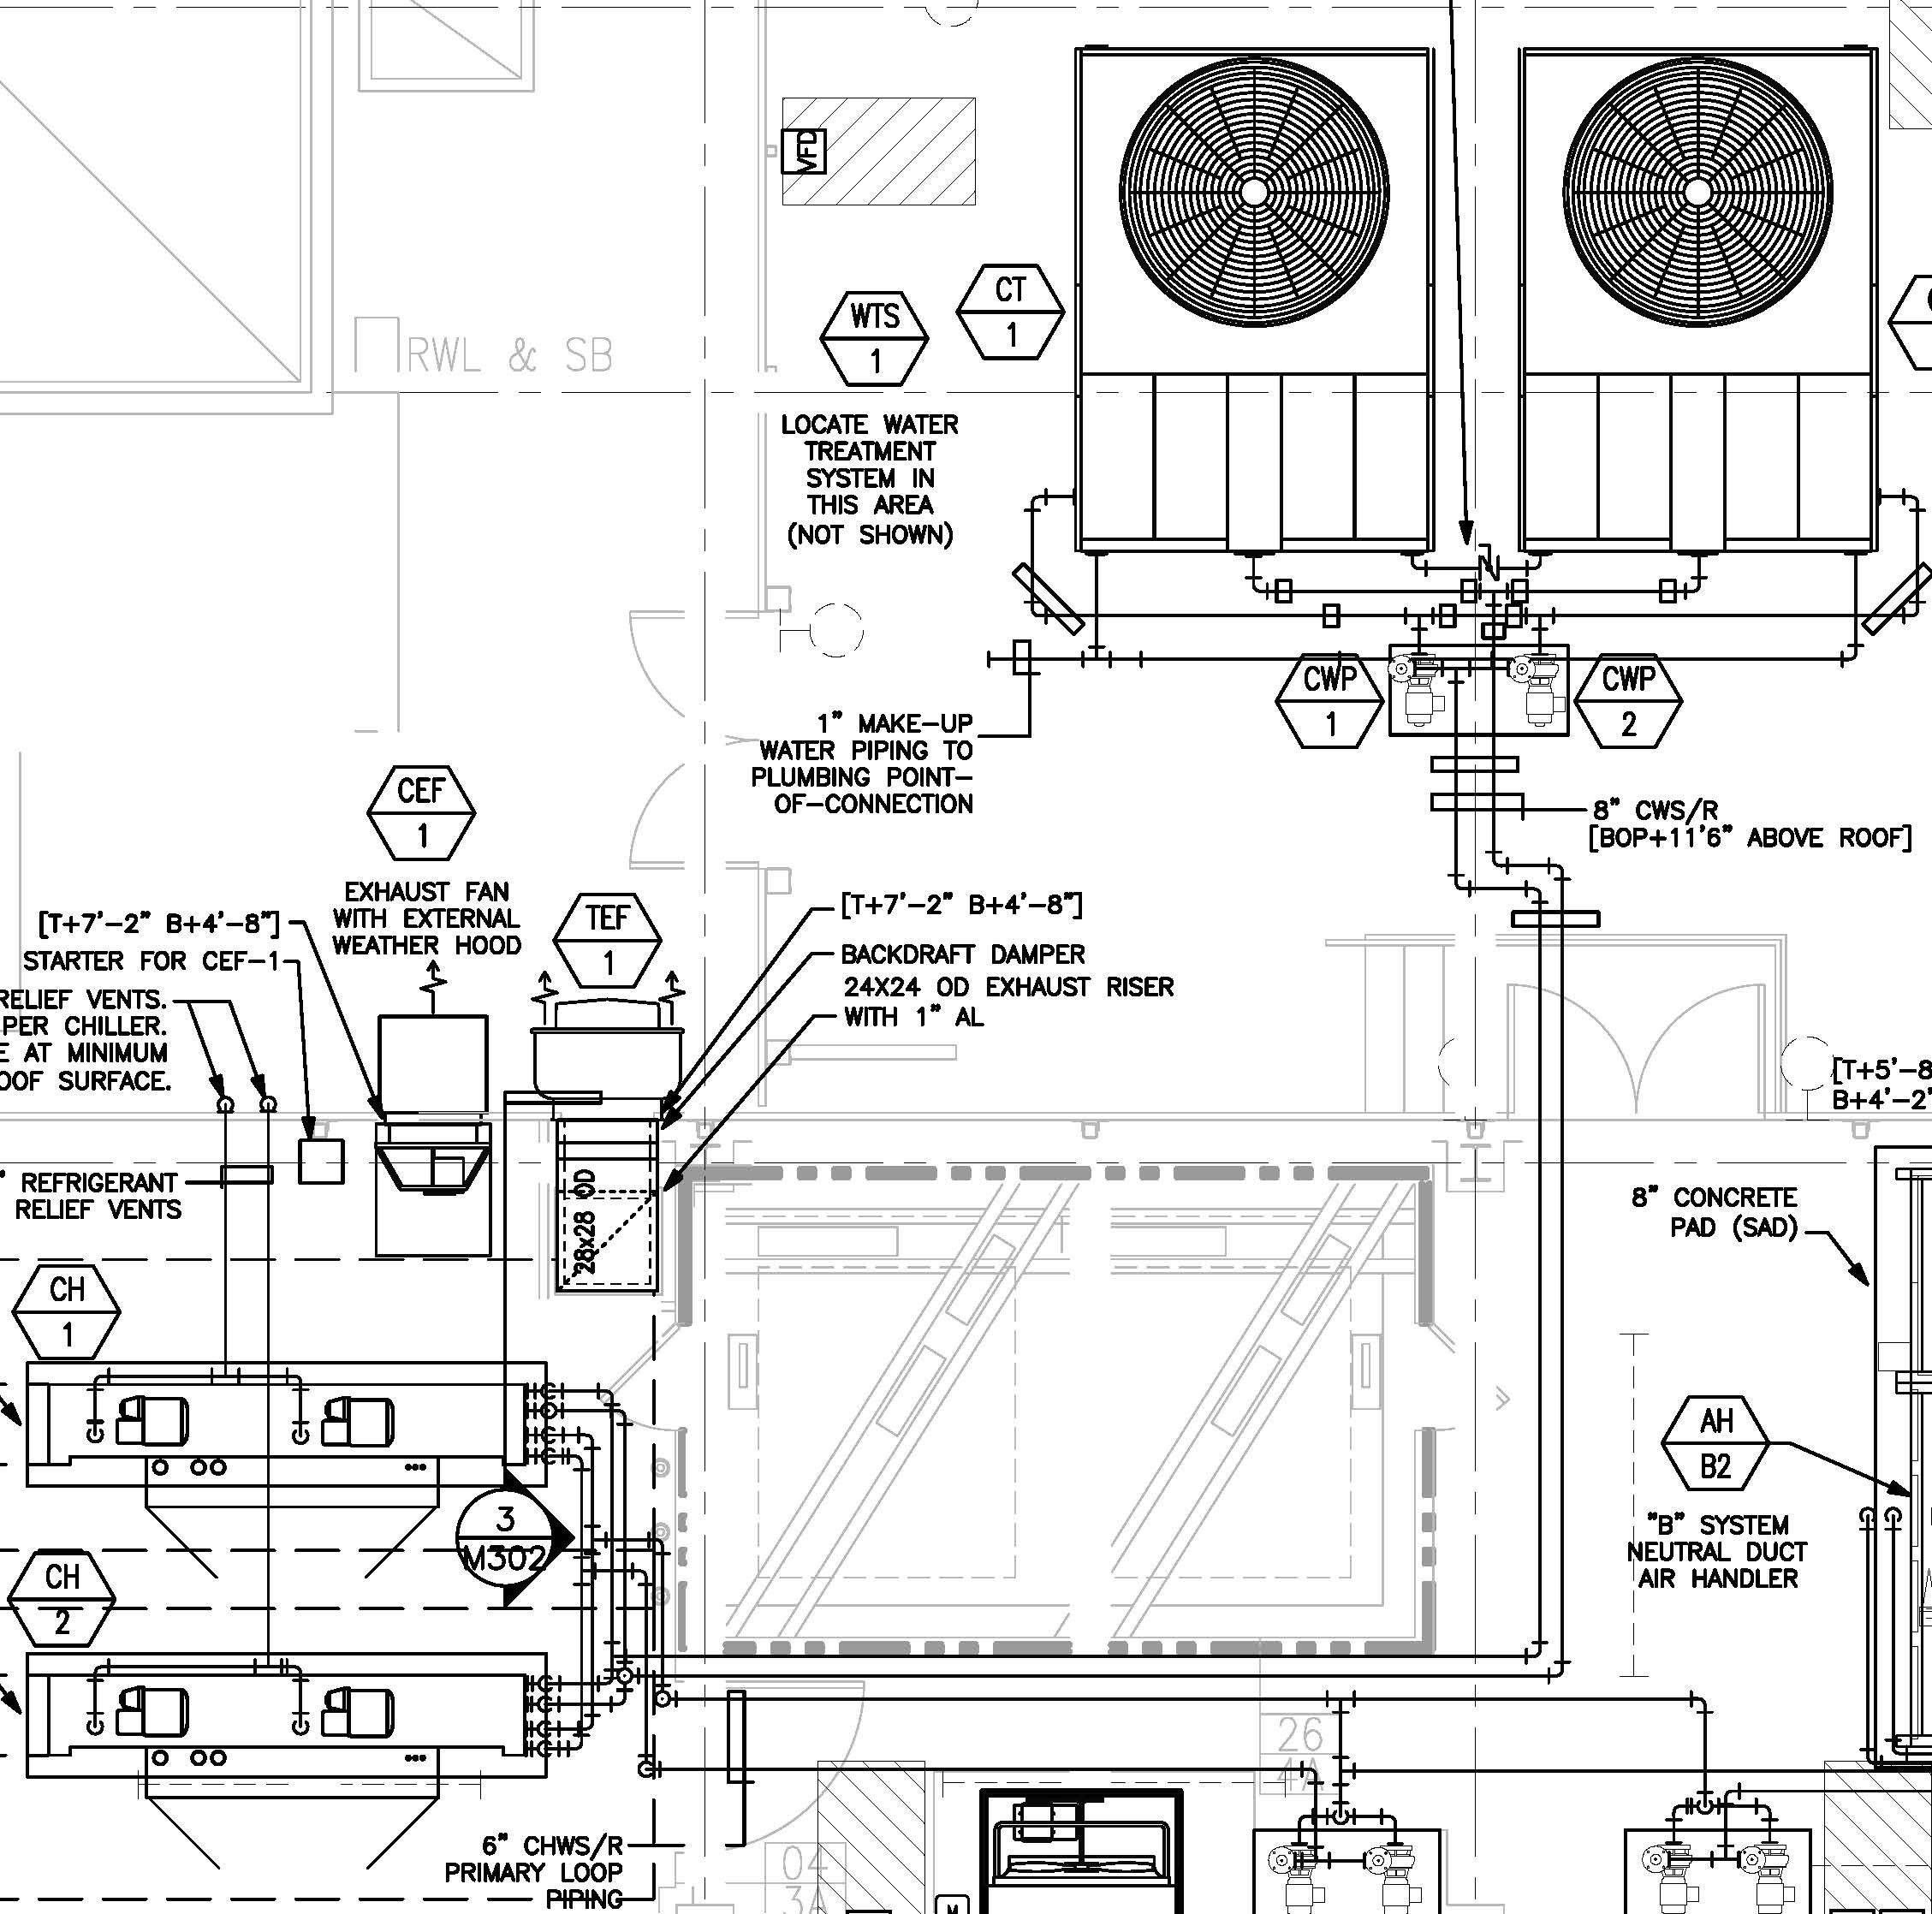 Unique Wiring Diagram for Air Compressor Pressure Switch #